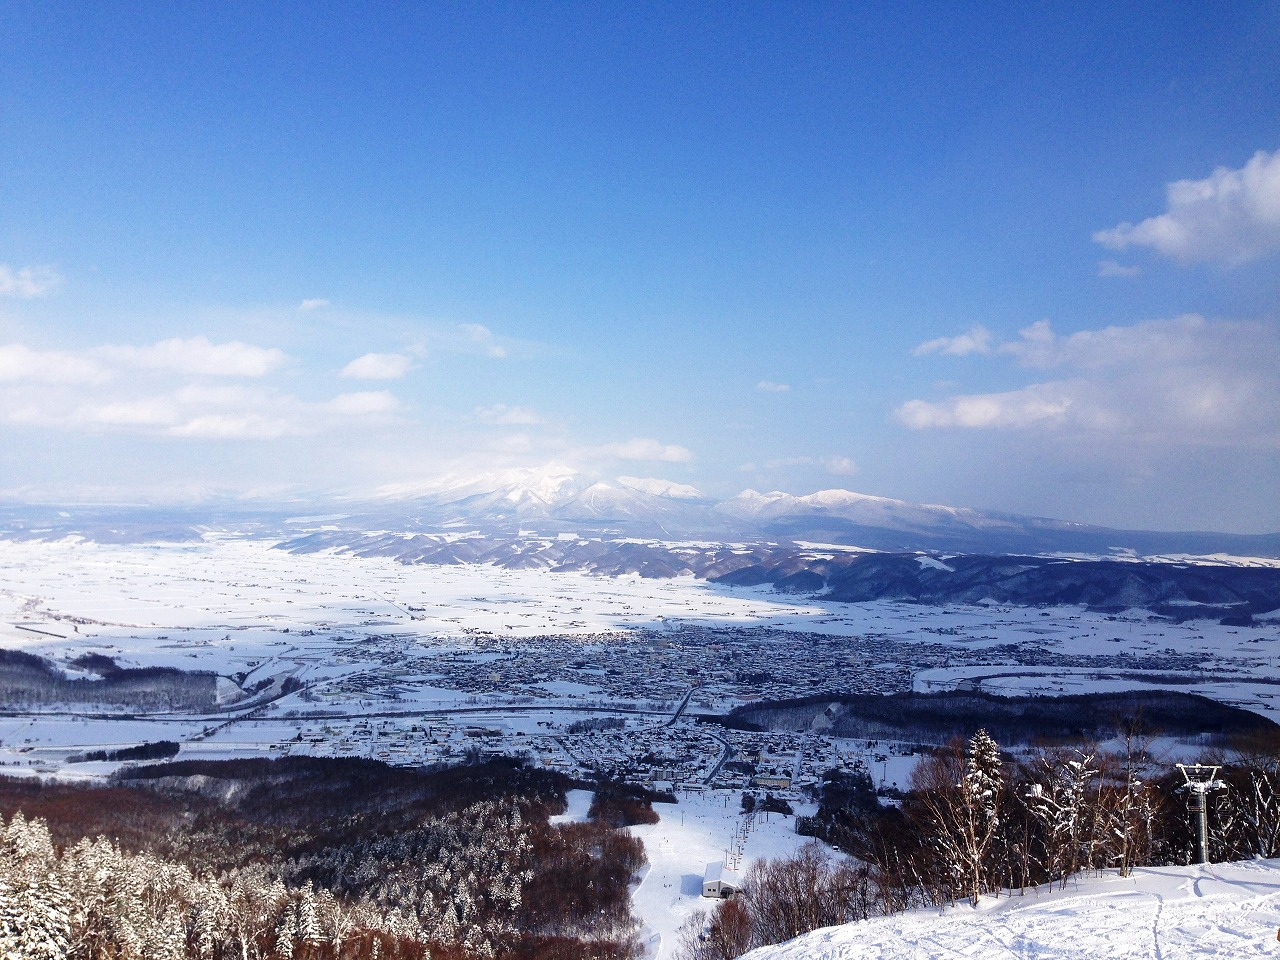 富良野スキー場山頂